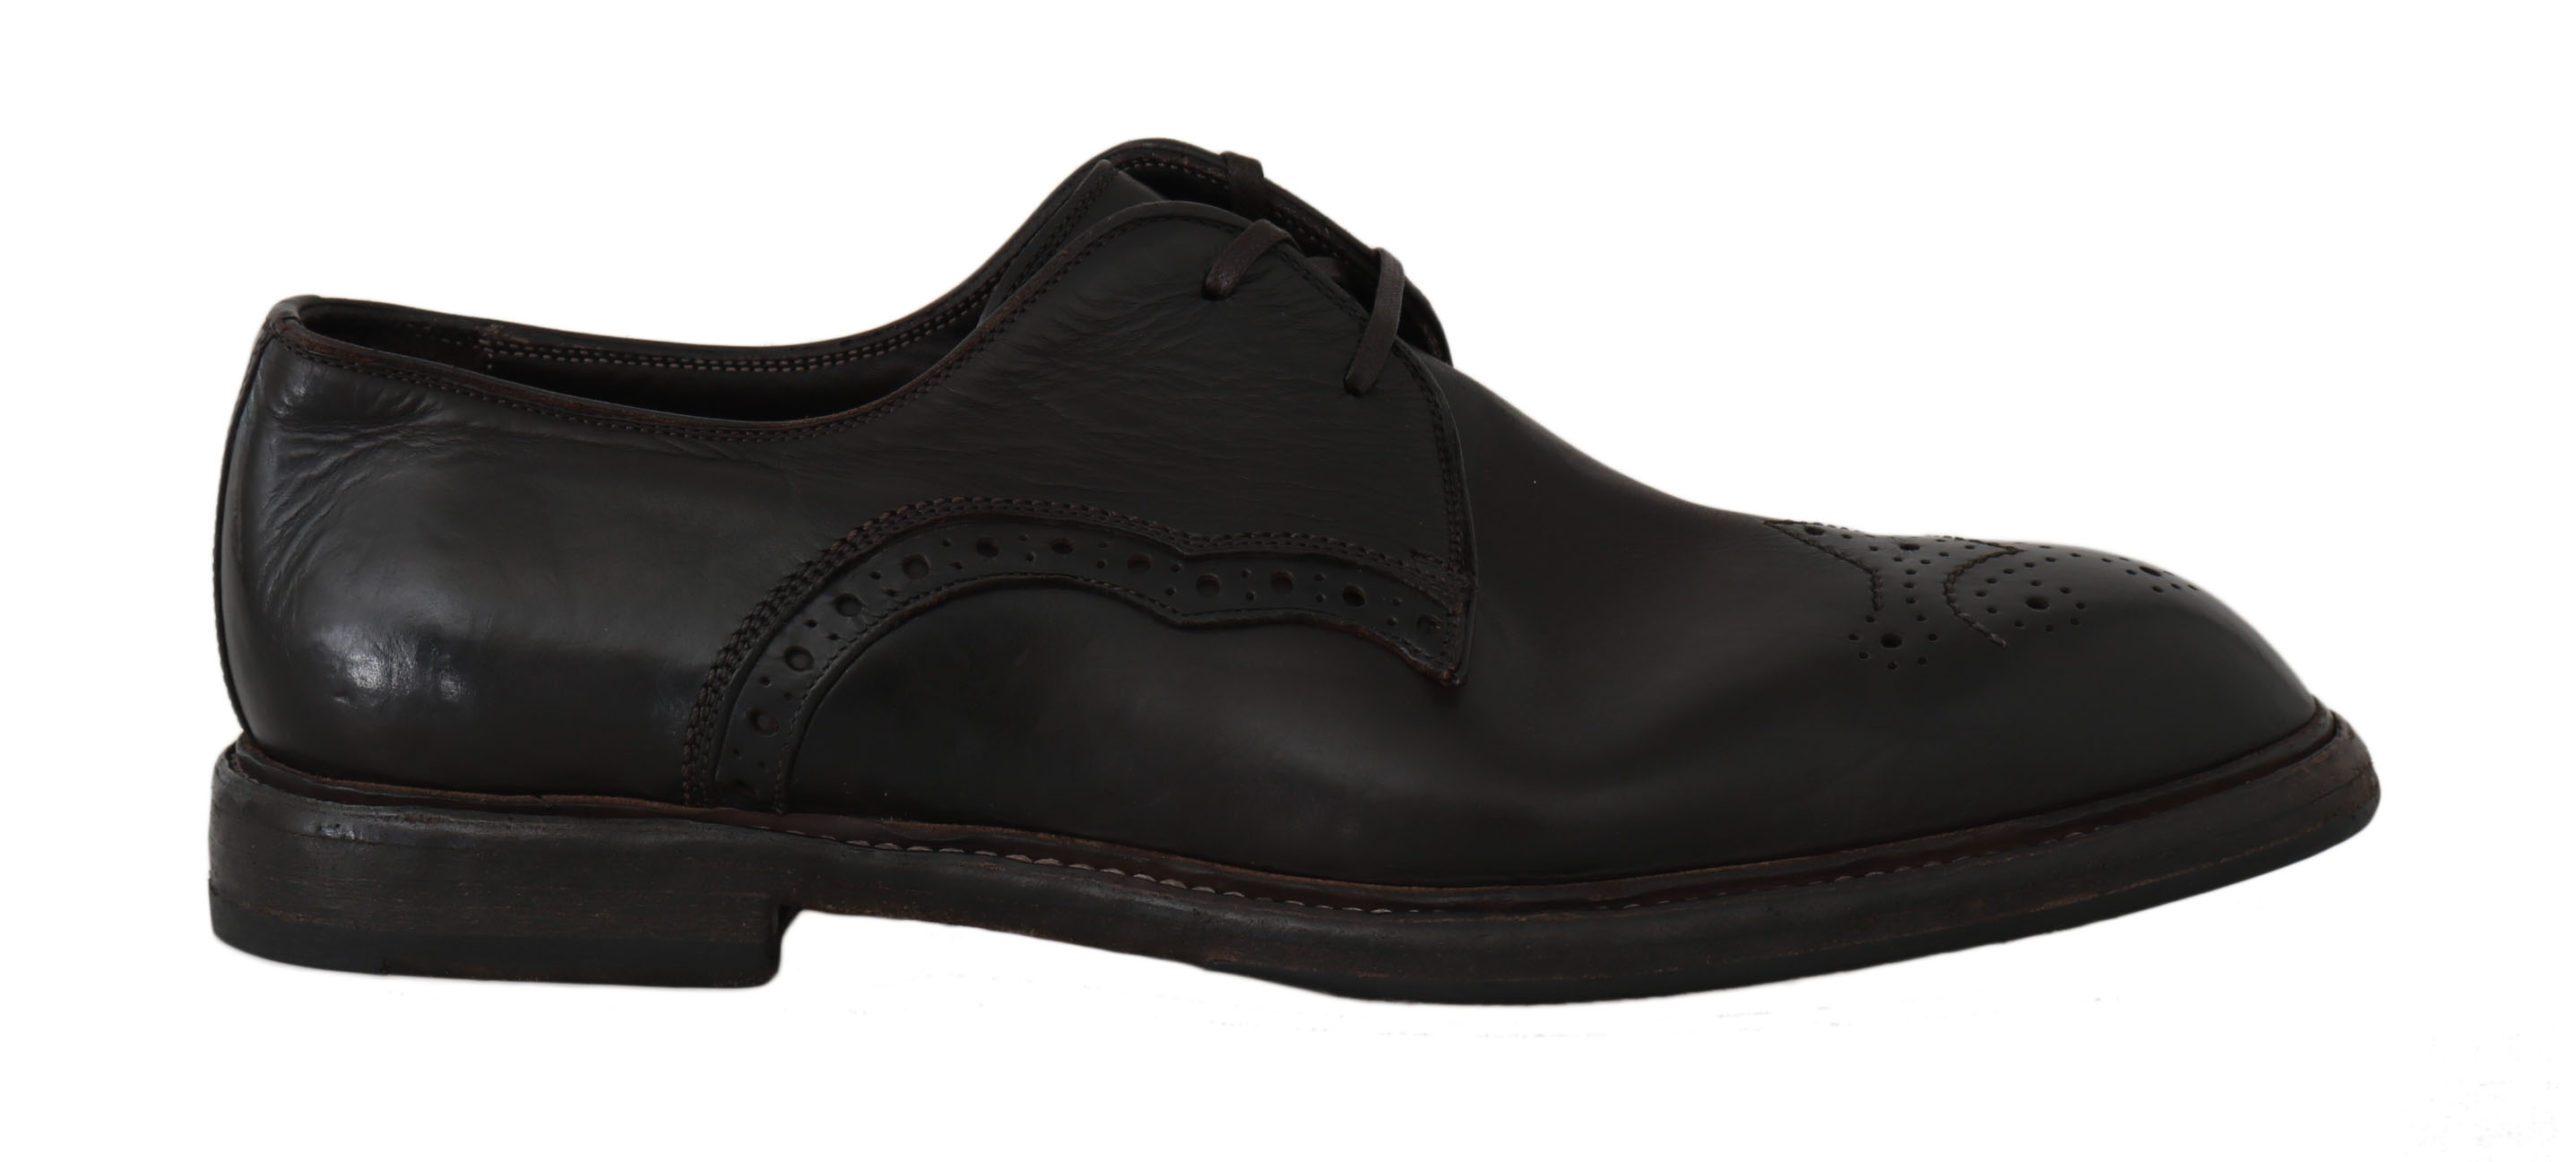 Dolce & Gabbana Men's Leather Marsala Derby Shoes Brown MV2182 - EU39/US6